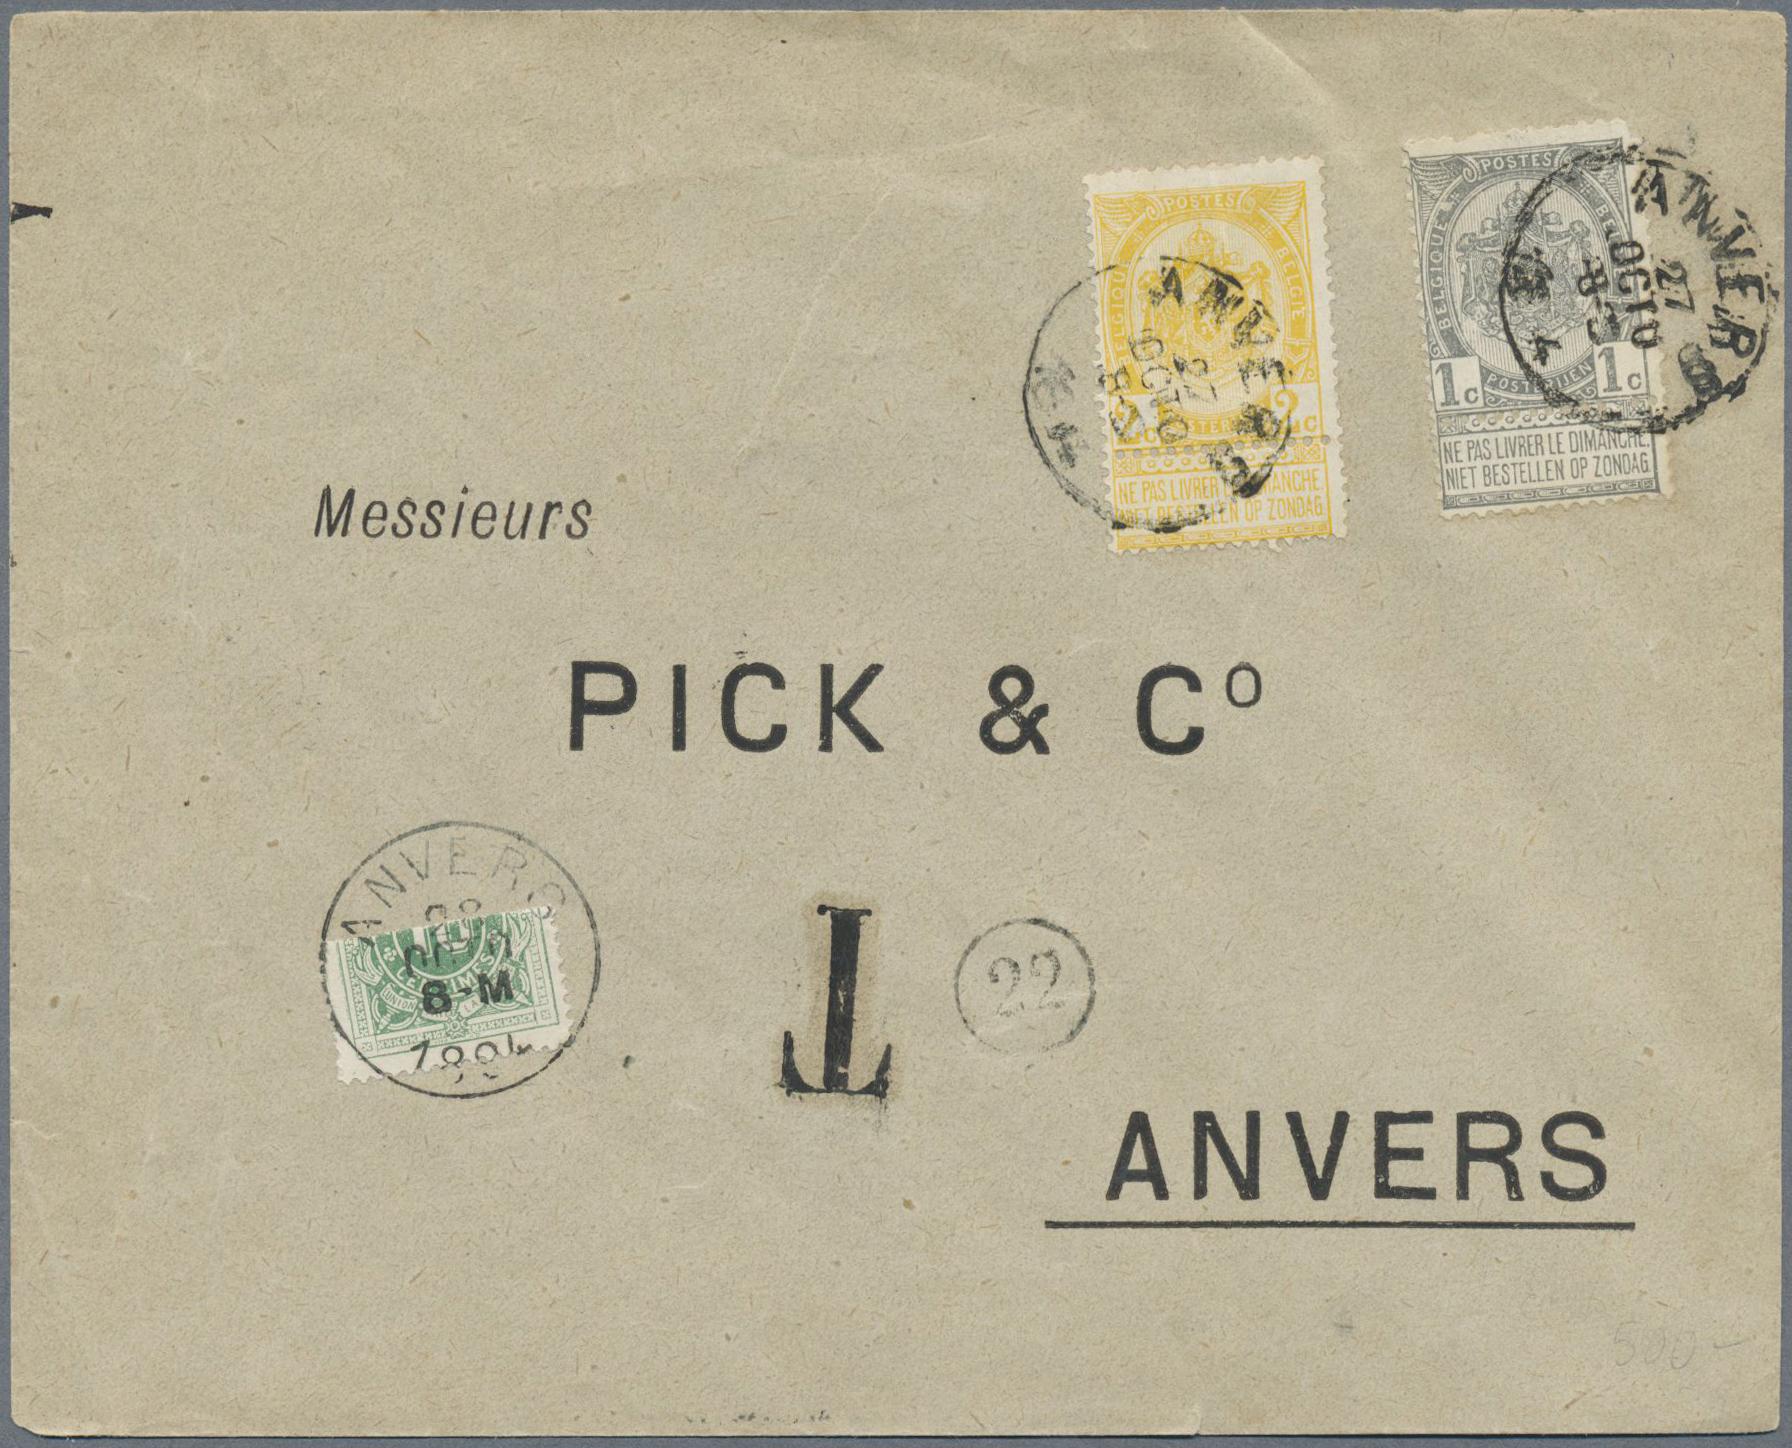 Lot 15655 - Belgien - Portomarken  -  Auktionshaus Christoph Gärtner GmbH & Co. KG Single lots Philately Overseas & Europe. Auction #39 Day 4